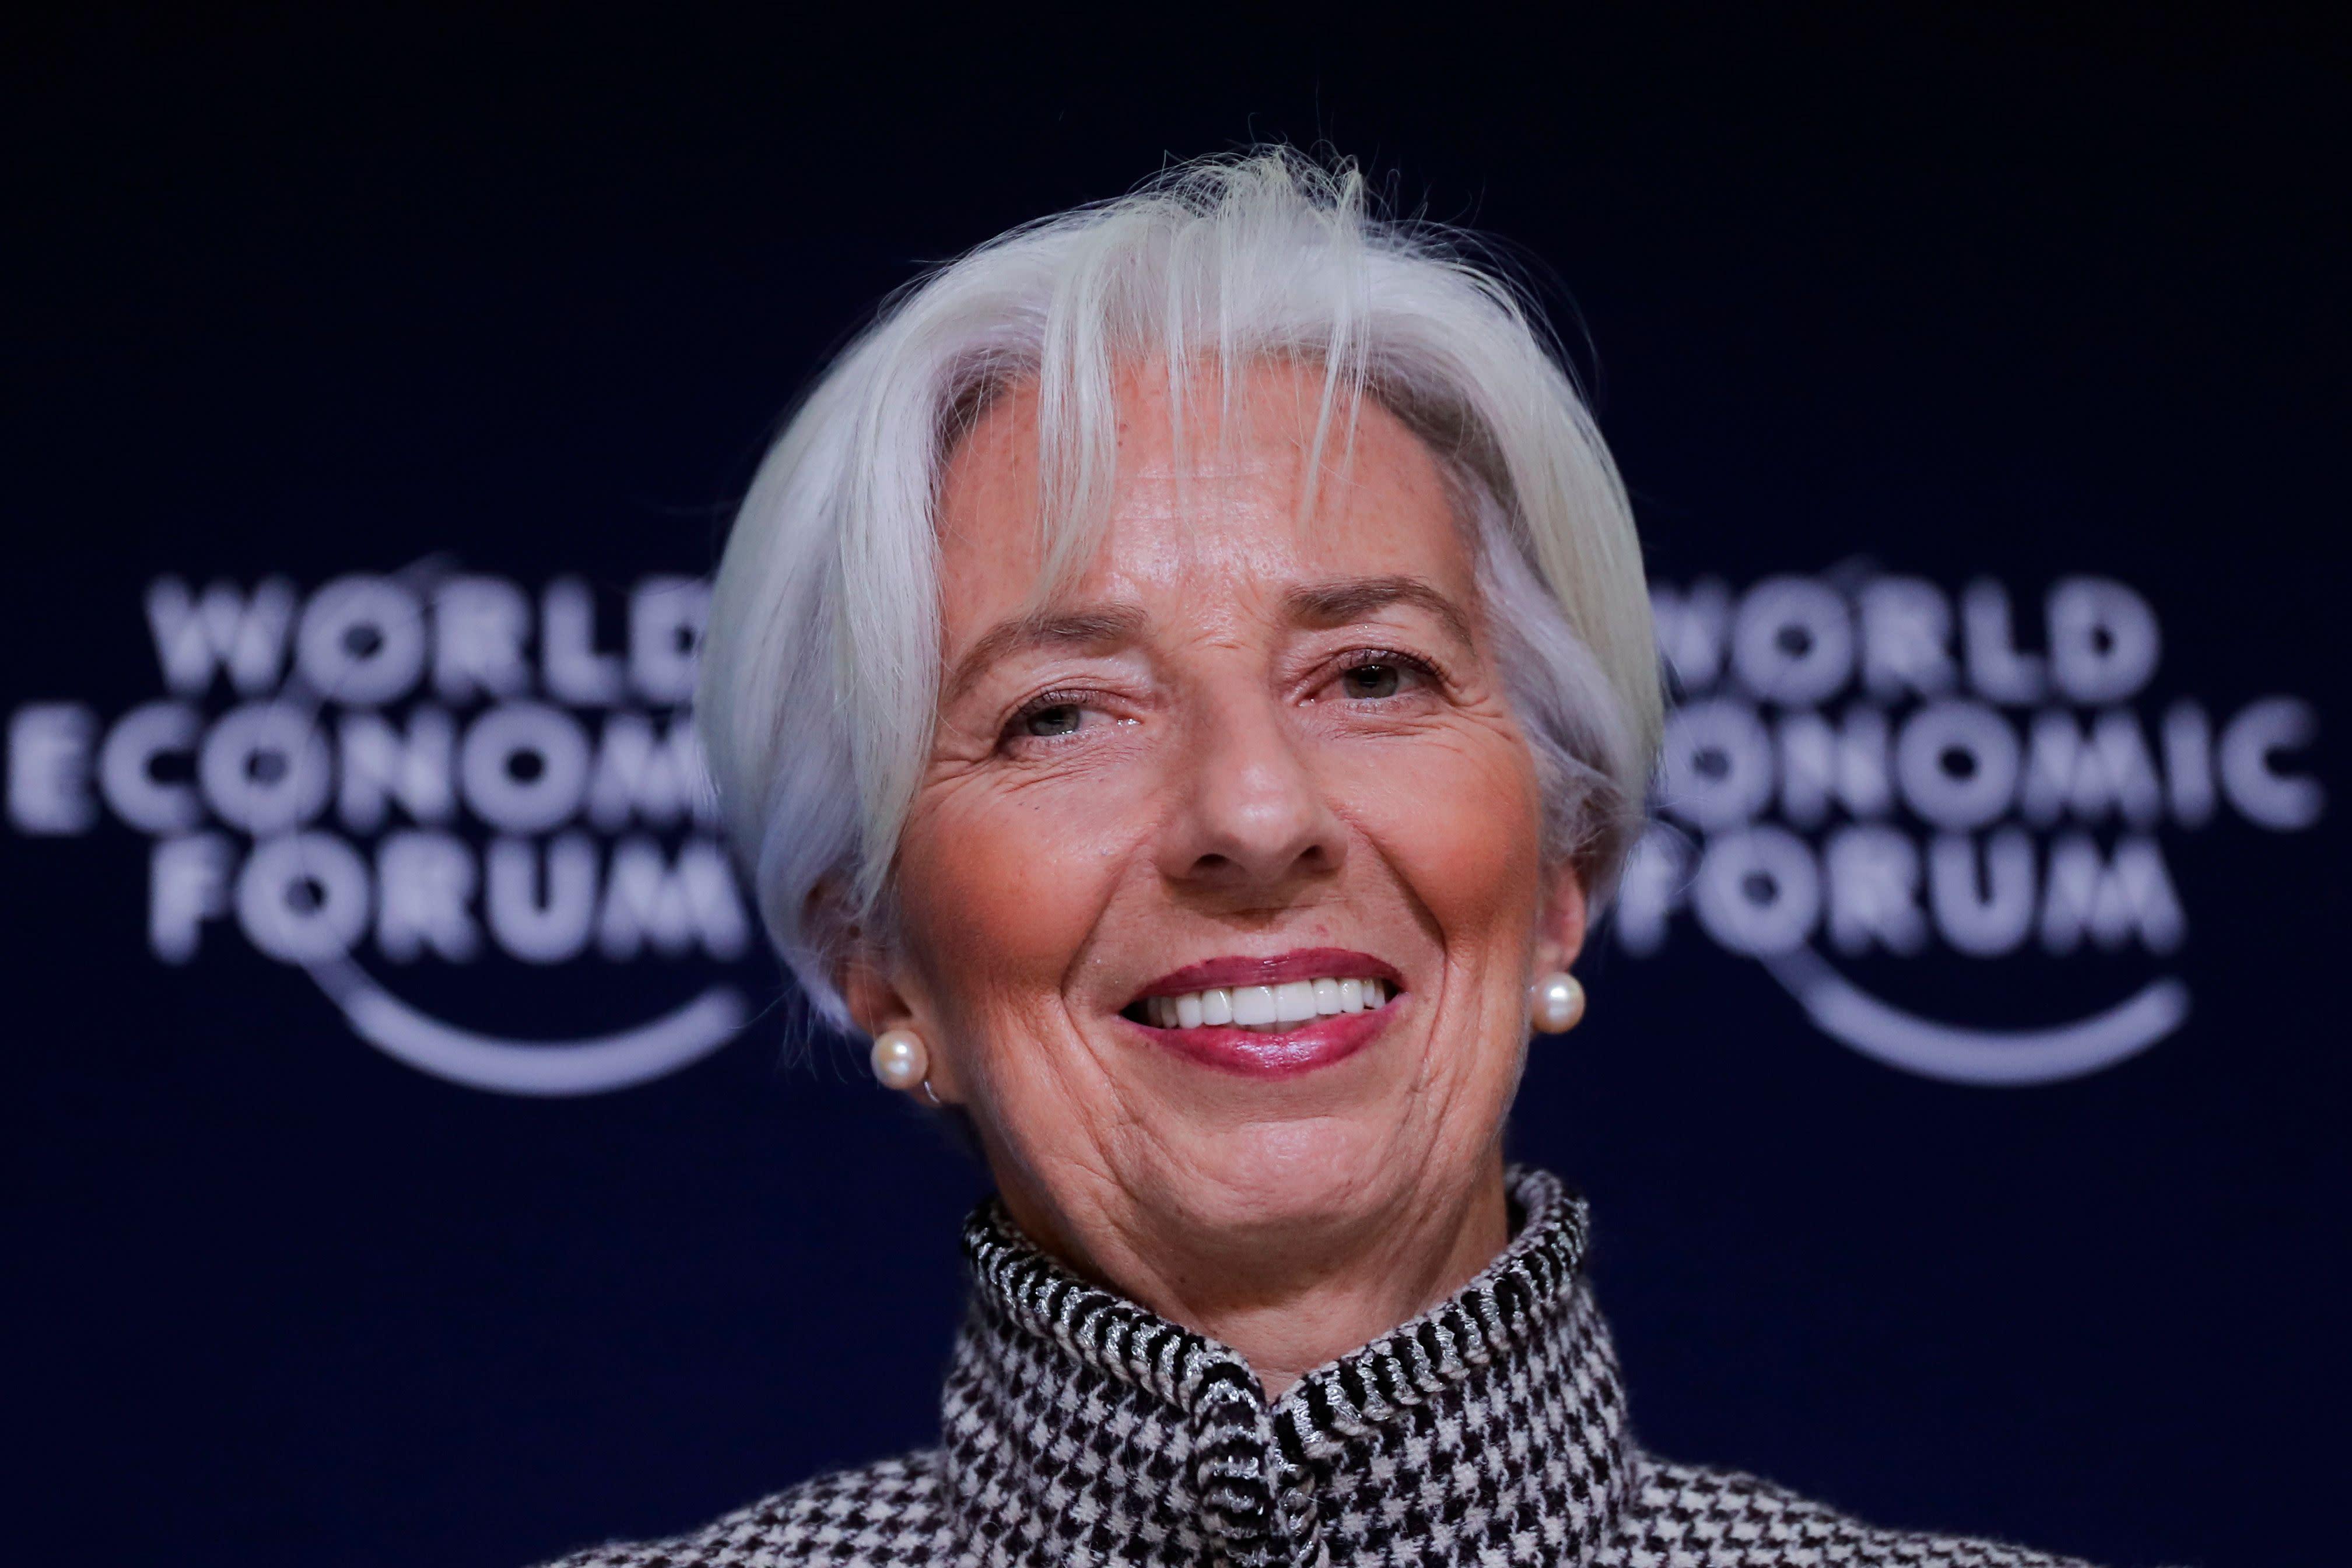 IMF Chair Lagarde has some economic advice for Trump